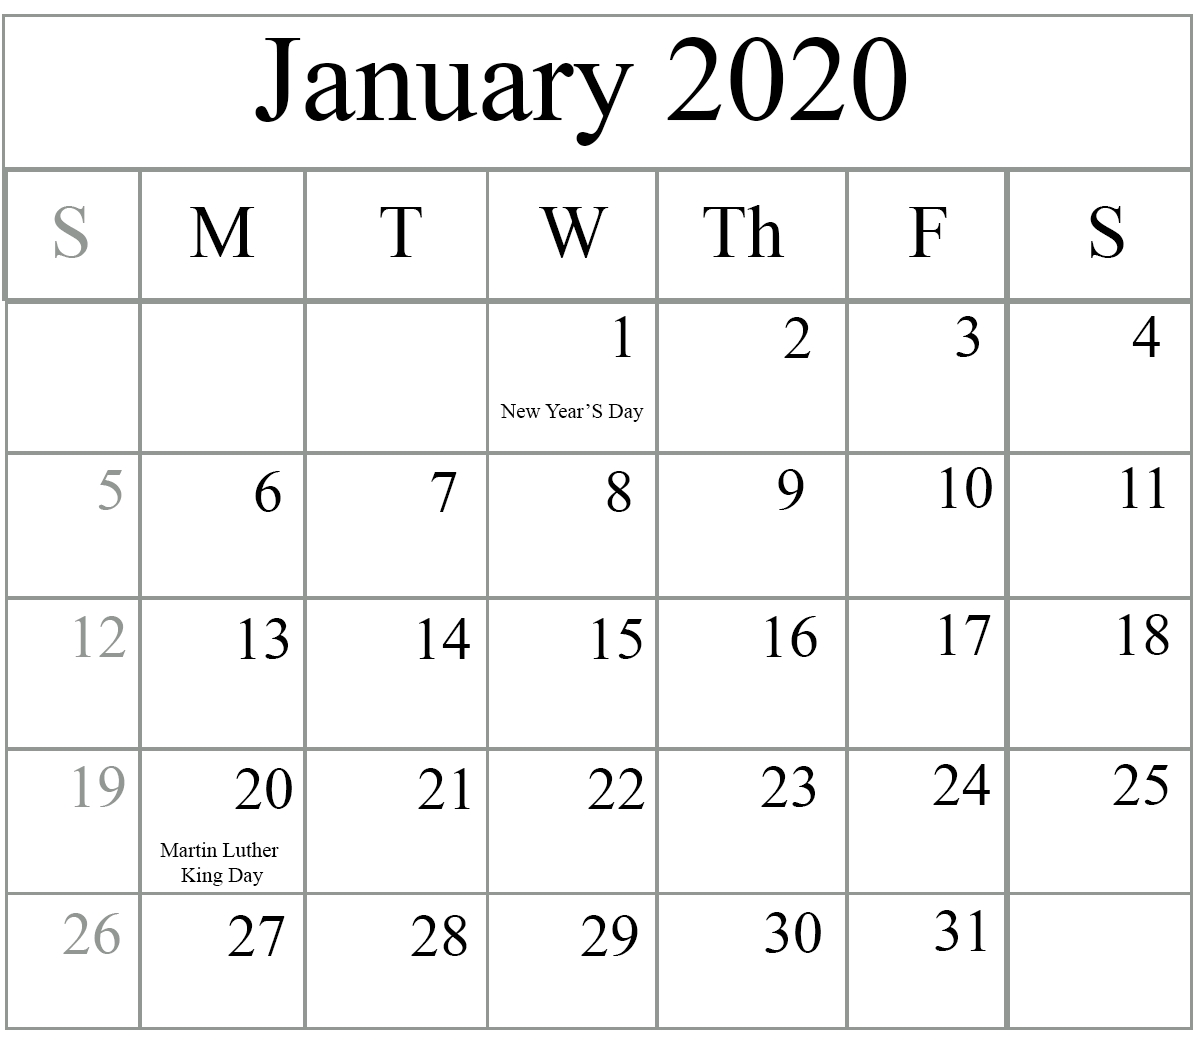 Free January 2020 Printable Calendar In Pdf, Excel & Word-Microsoft Word Calendar Template 2020 Edit